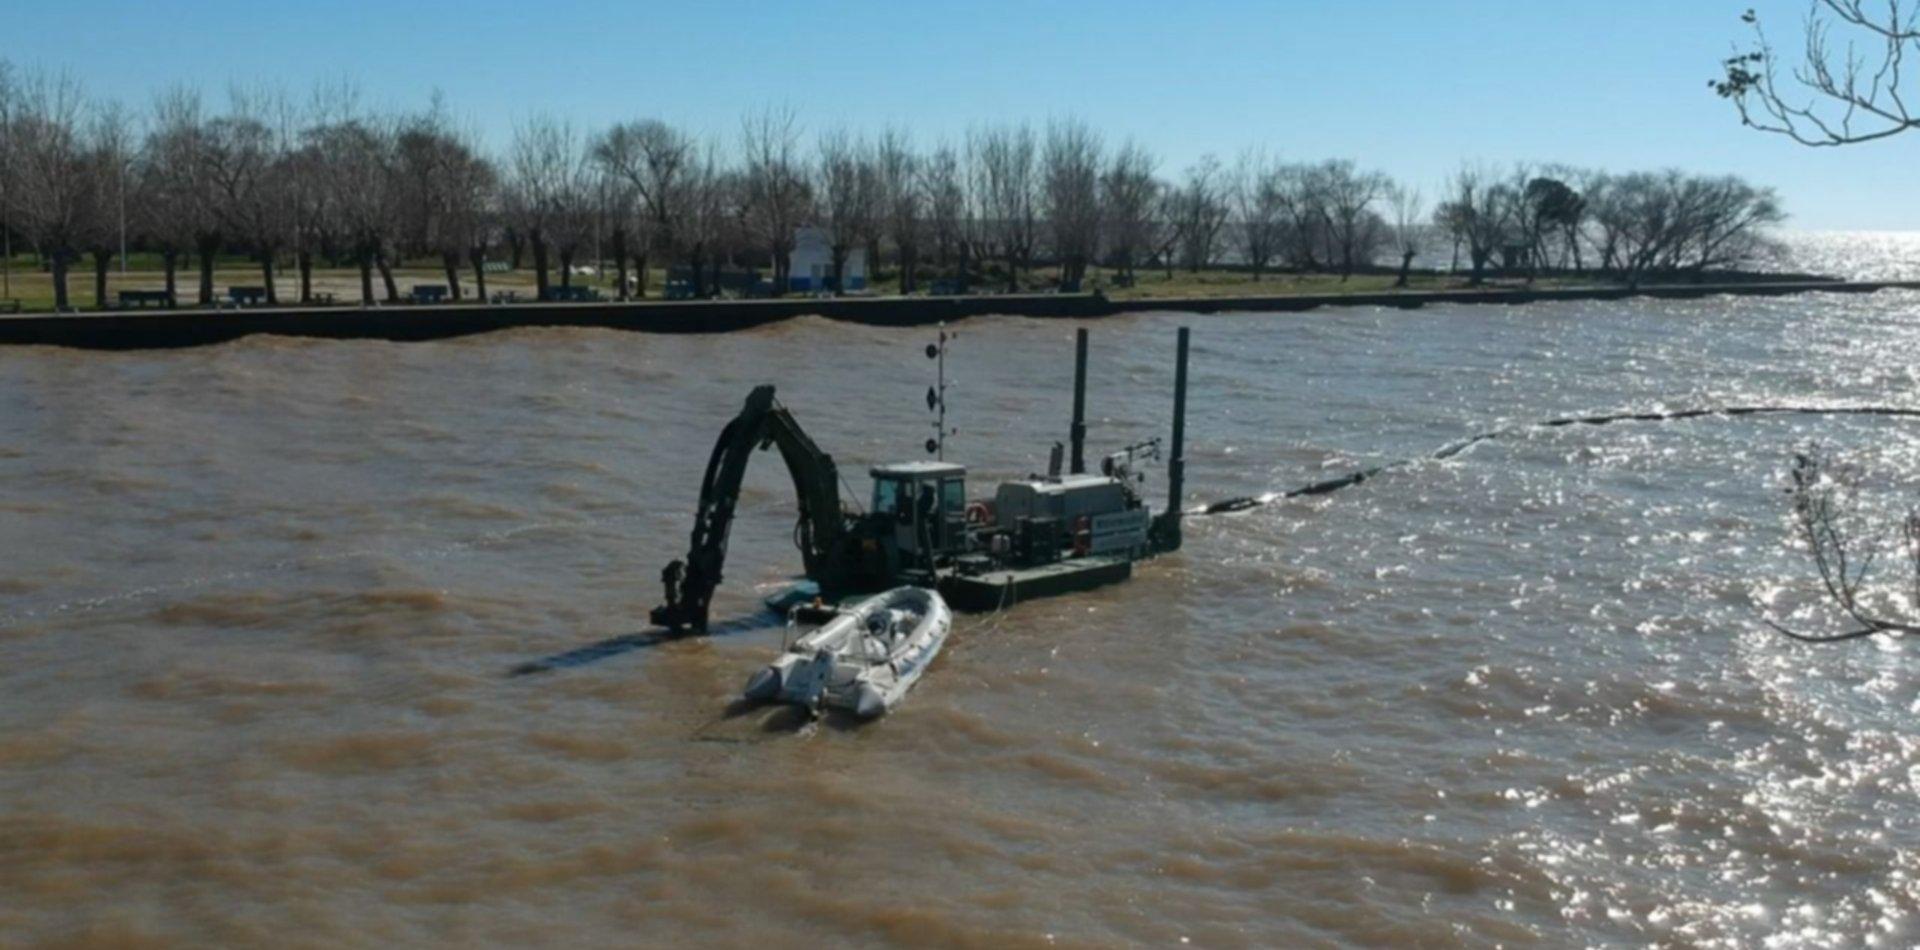 Después de 35 años comenzó una obra clave para evitar la falta de agua en La Plata